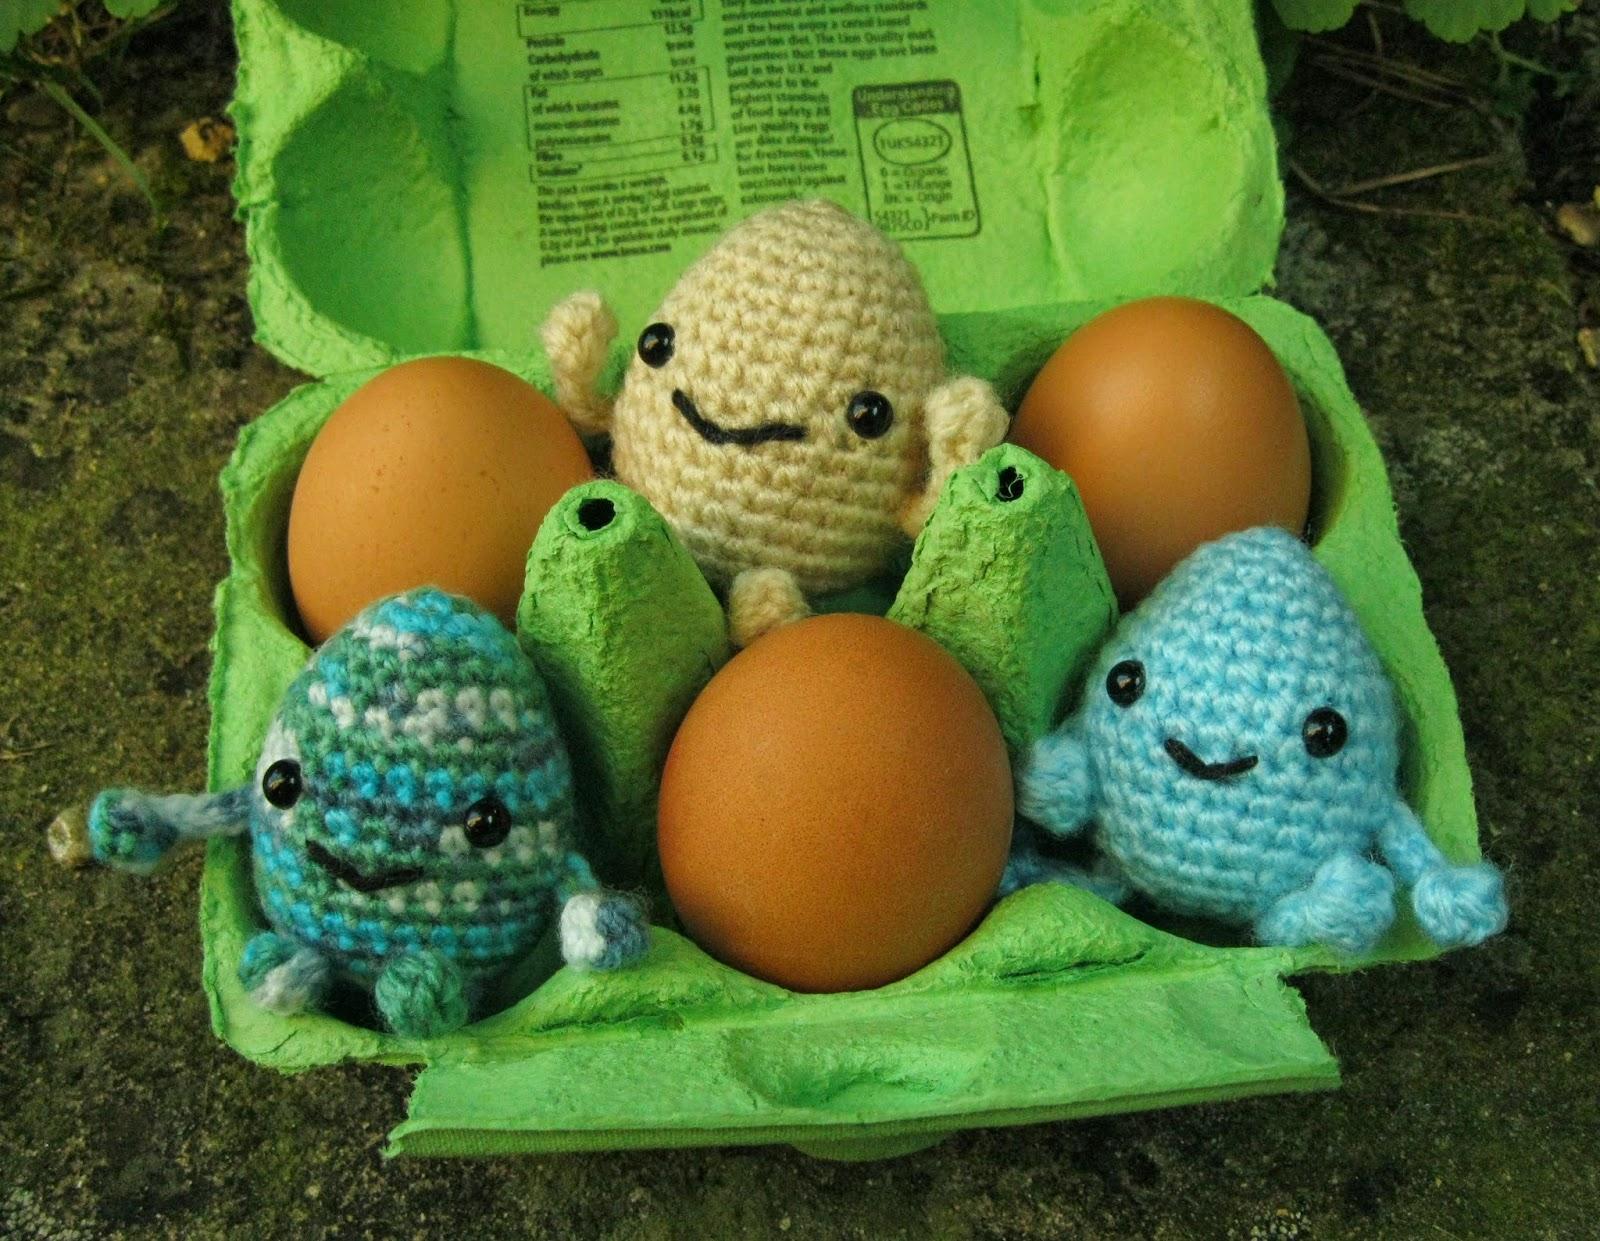 Amigurumi Crochet Egg Pattern : LucyRavenscar - Crochet Creatures: Easter Patterns